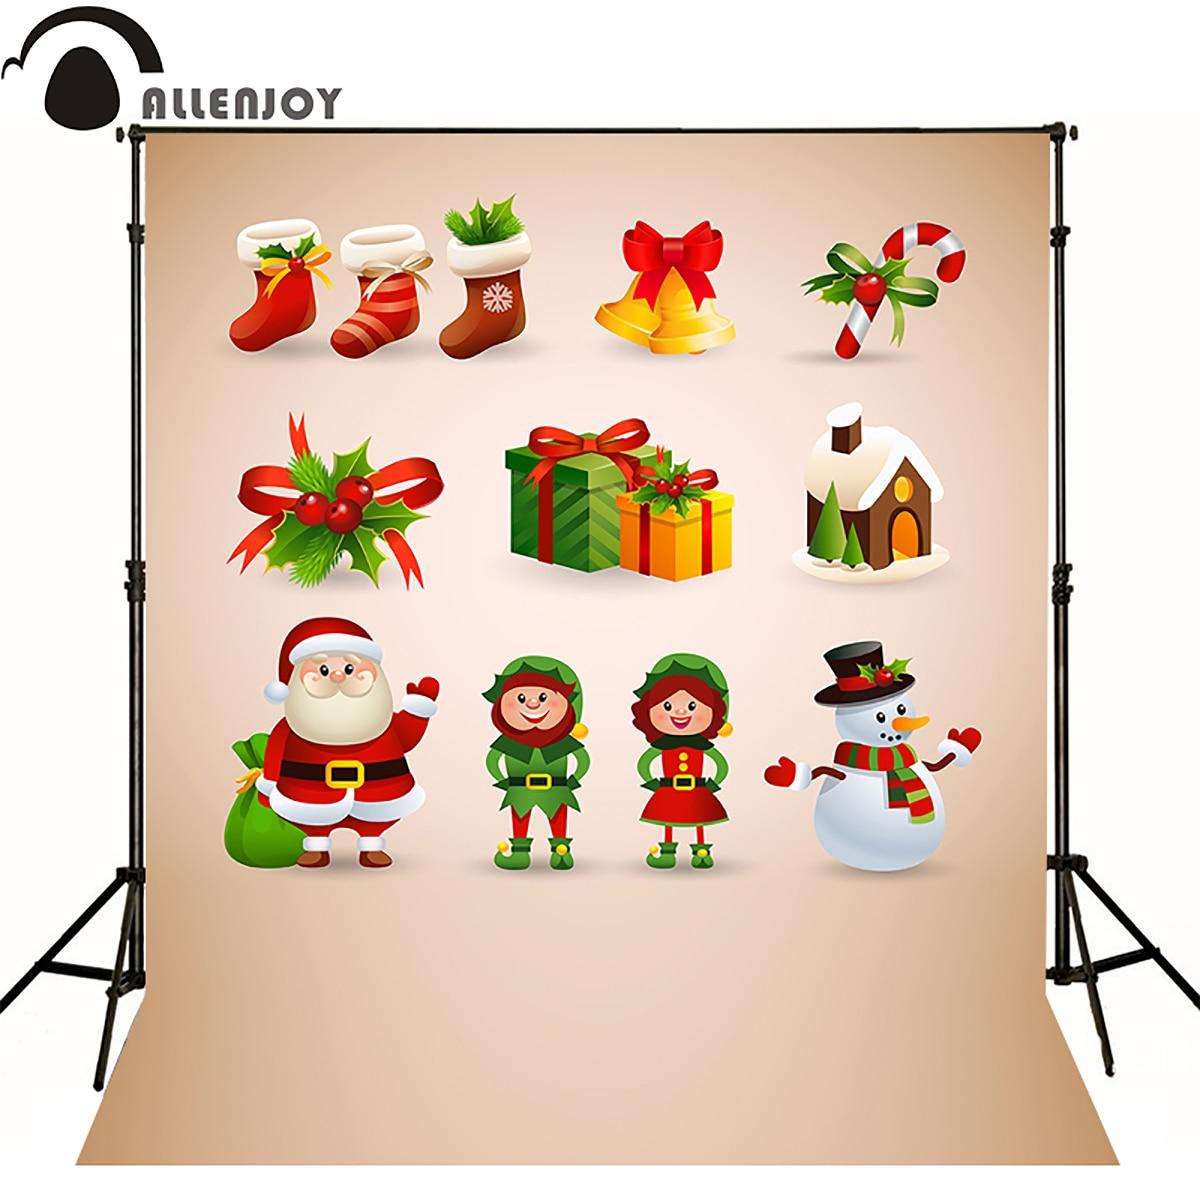 Allen joy christmas photography backdrops gift candy santa claus snowman elf mistletoe newborn baby shower photocall happy neje st0006 4 christmas stretch santa claus gift snowman doll red white